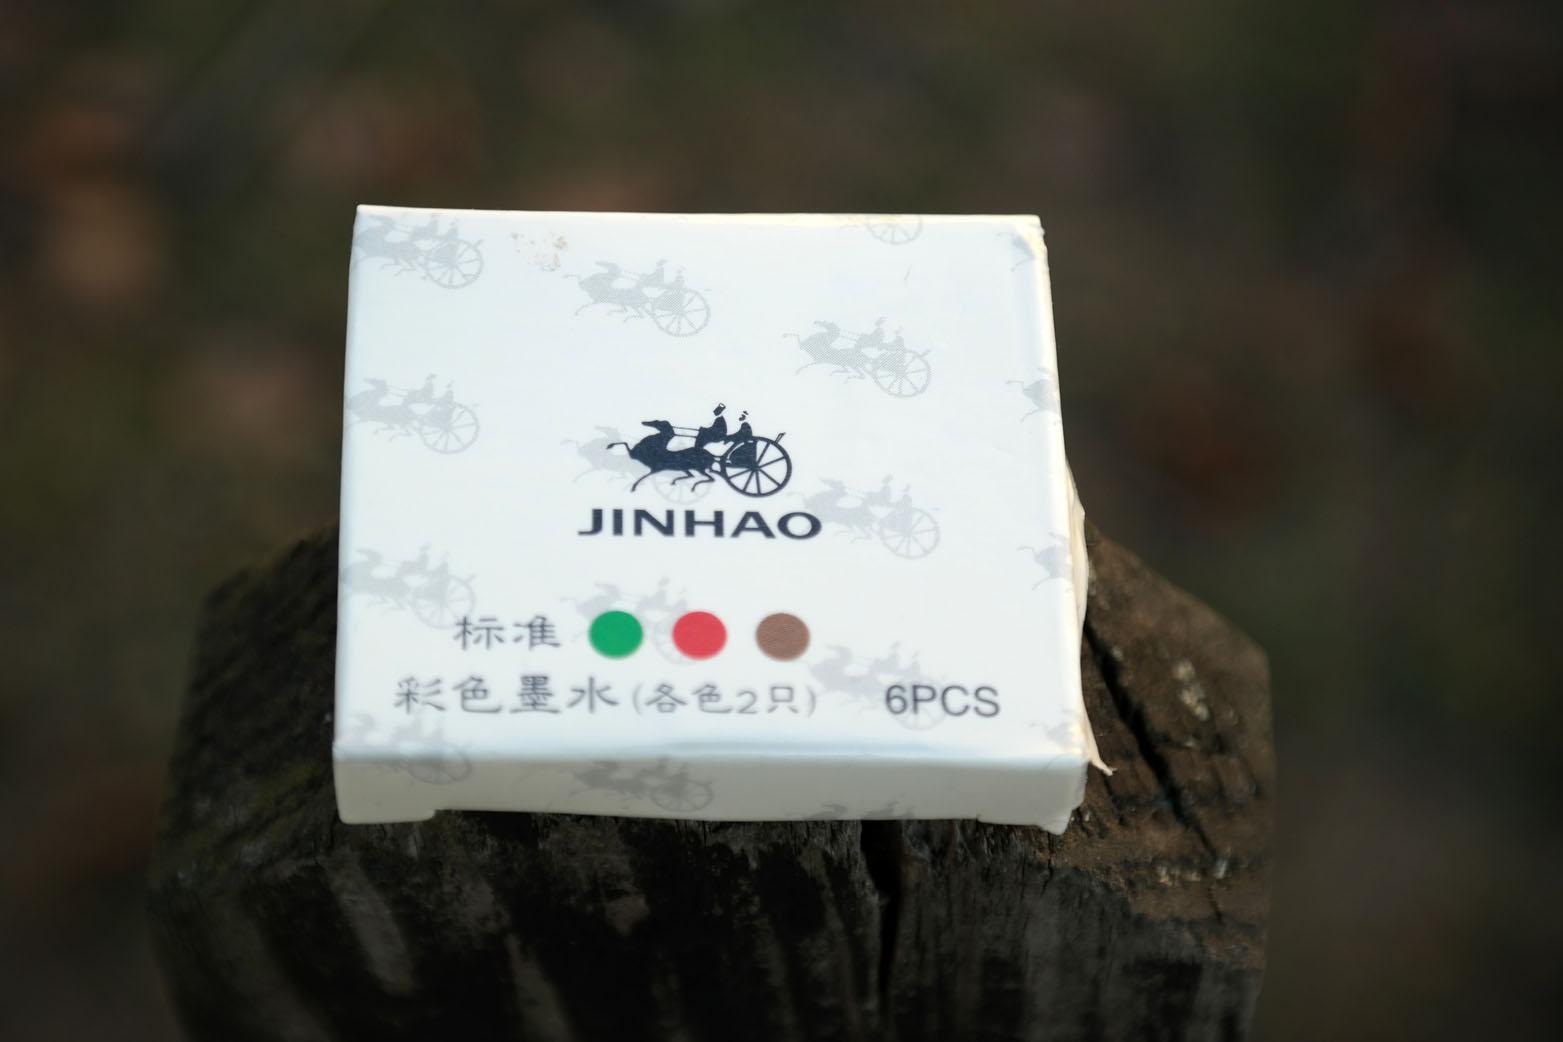 fpn_1455225363__jinhao_cartridges.jpg